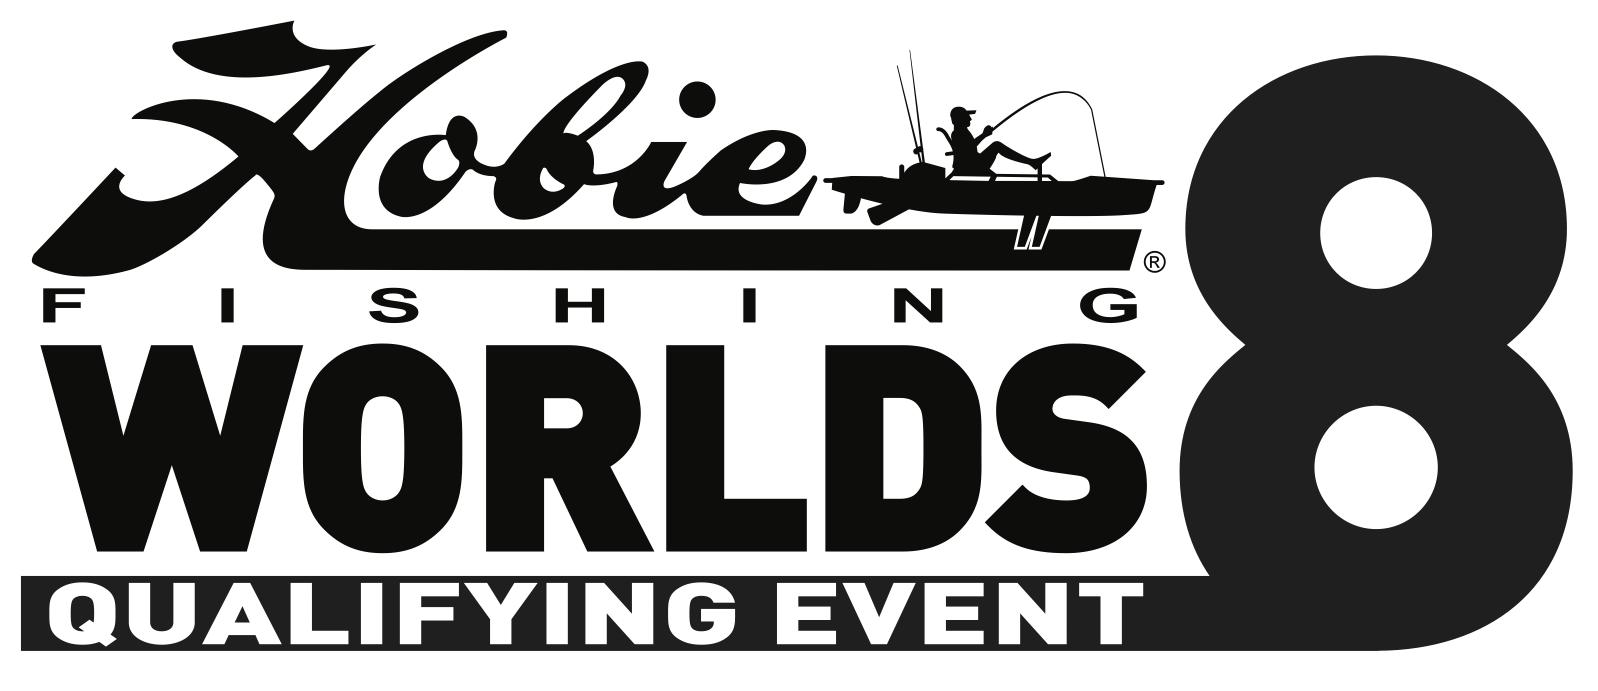 Hobie Worlds 8 Logo - Black